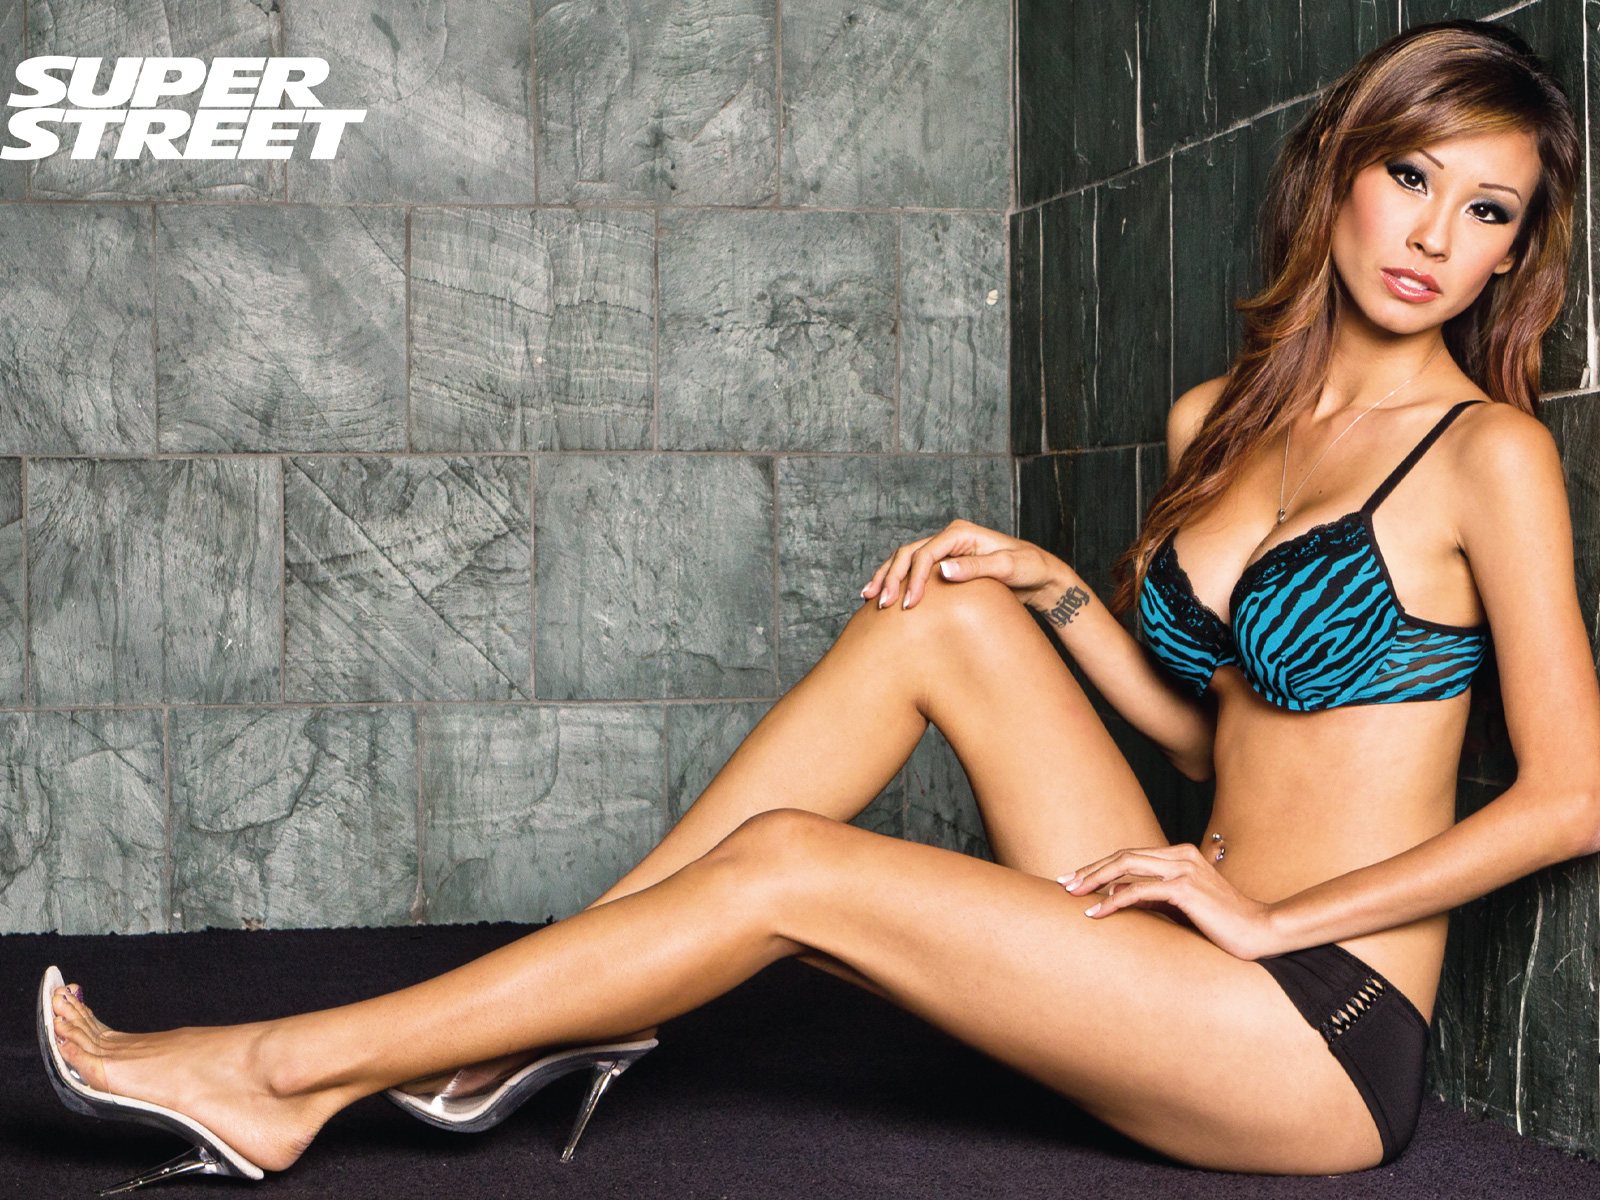 Import Model Wallpapers Free Stuff Super Street Magazine